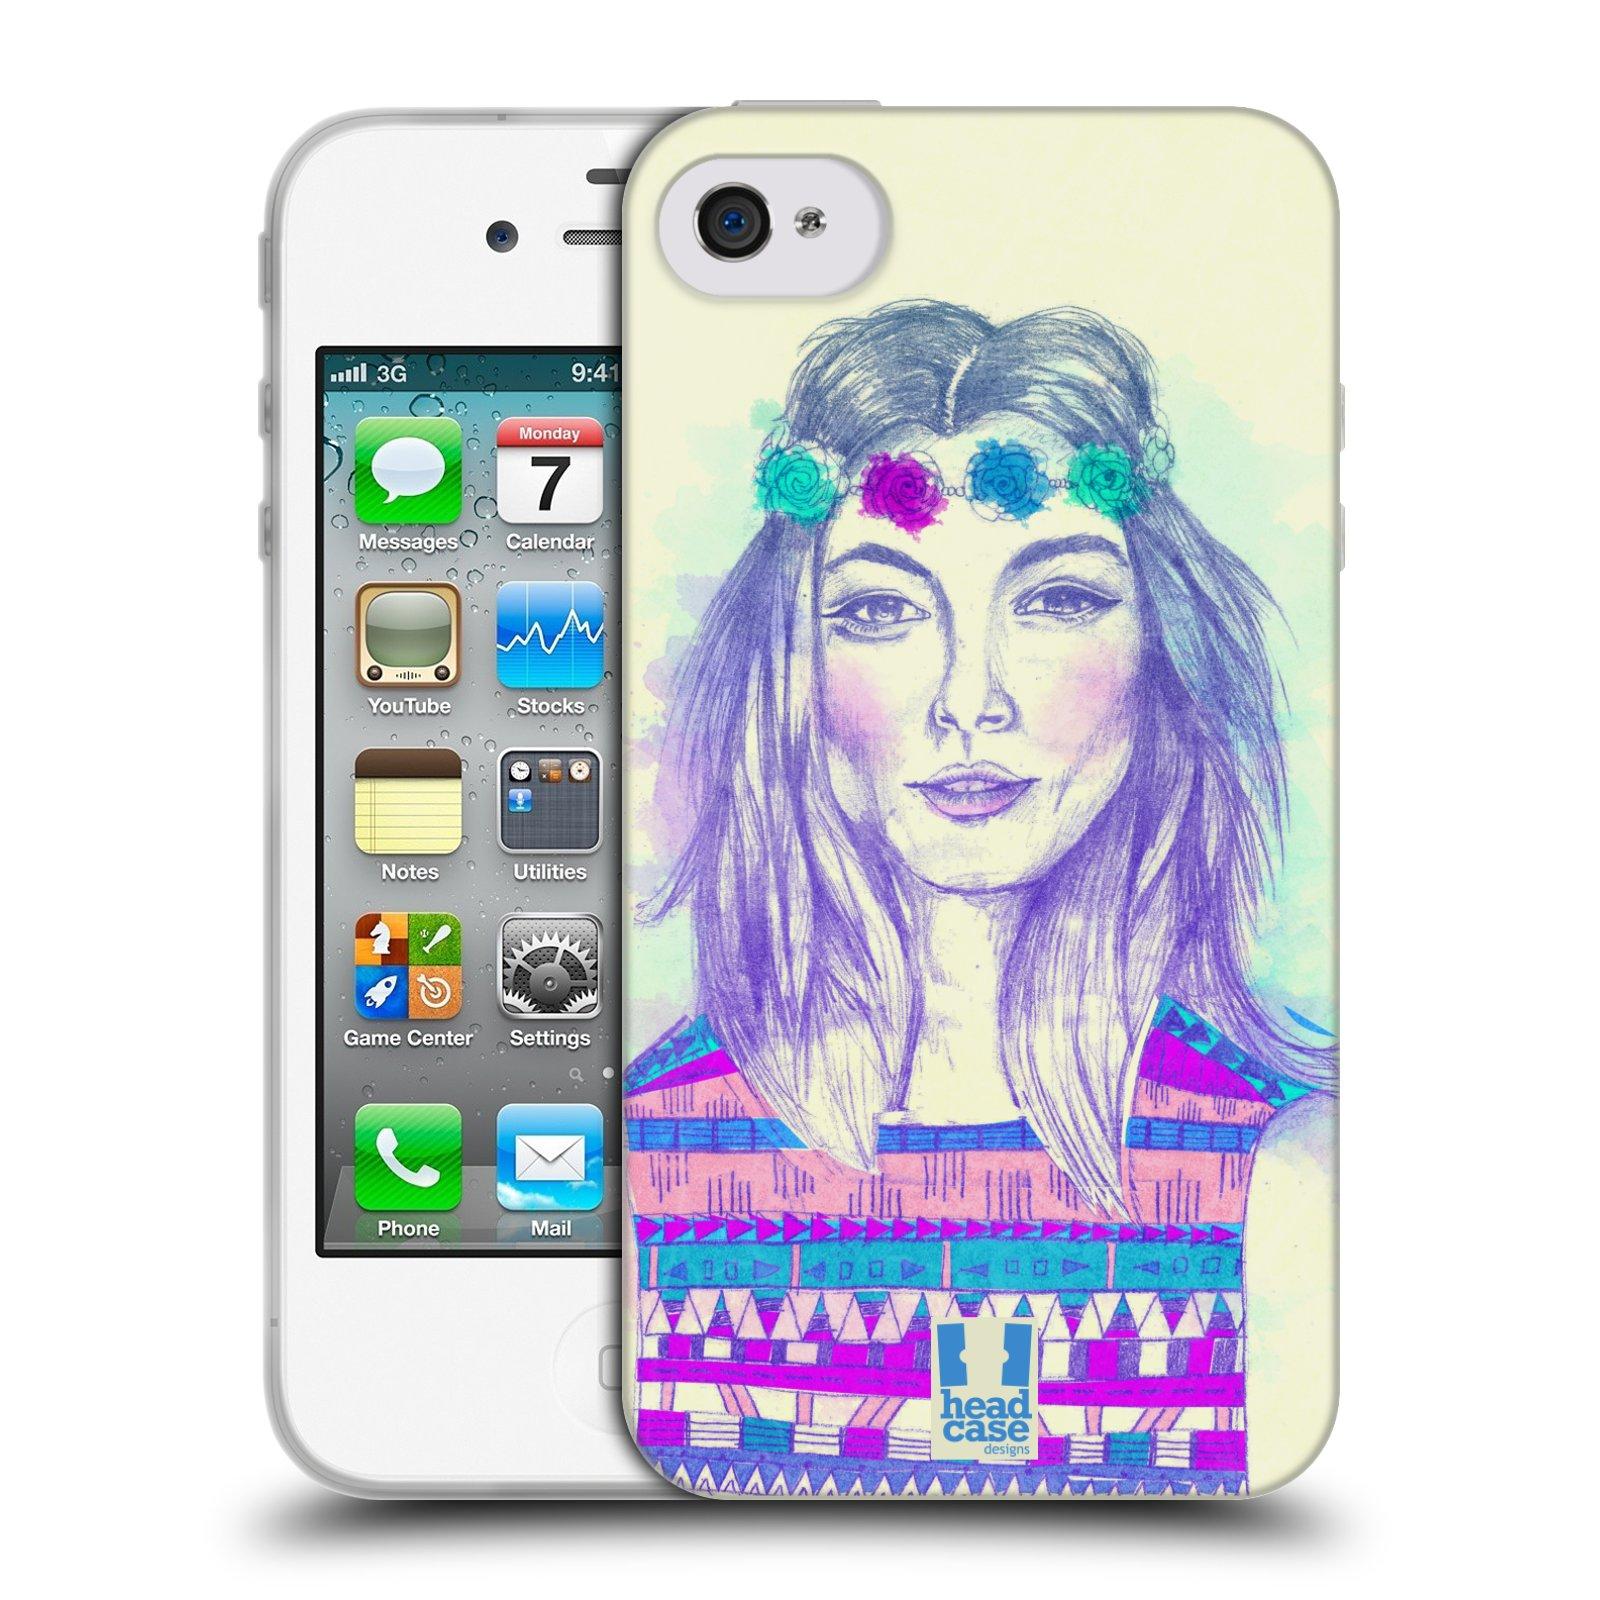 HEAD CASE silikonový obal na mobil Apple Iphone 4/4S vzor Dívka dlouhé květinové vlasy HIPPIE modrá